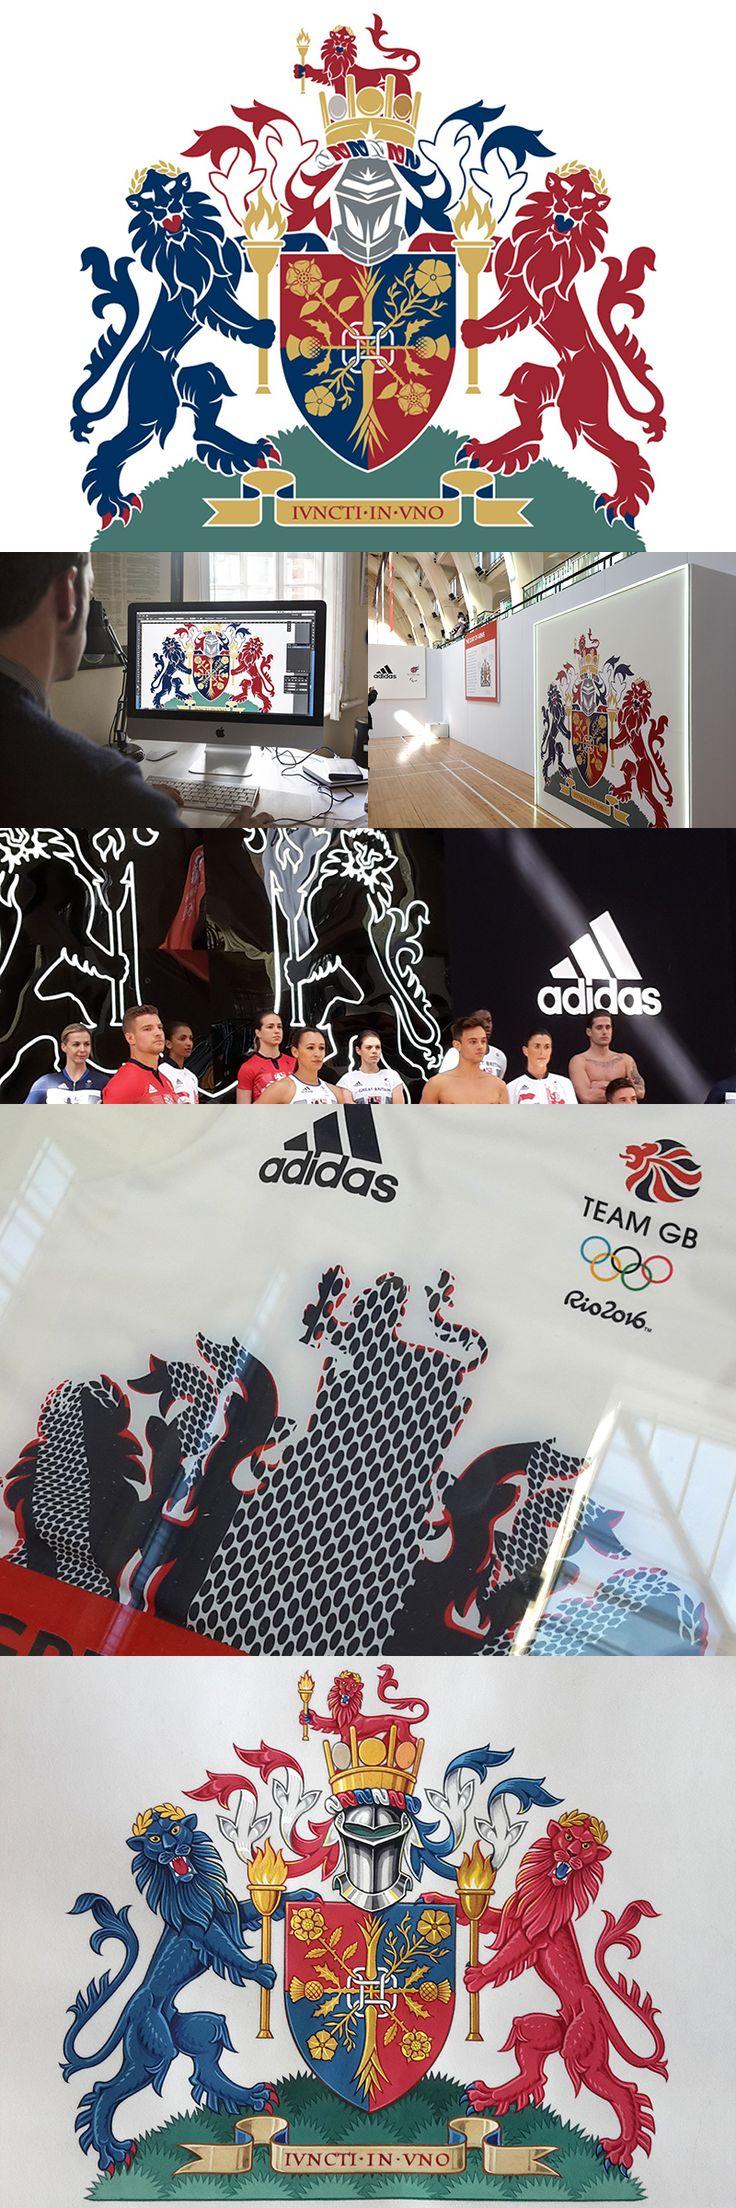 Digital heraldry design for the Team GB kit for the Rio 2016 Olympics